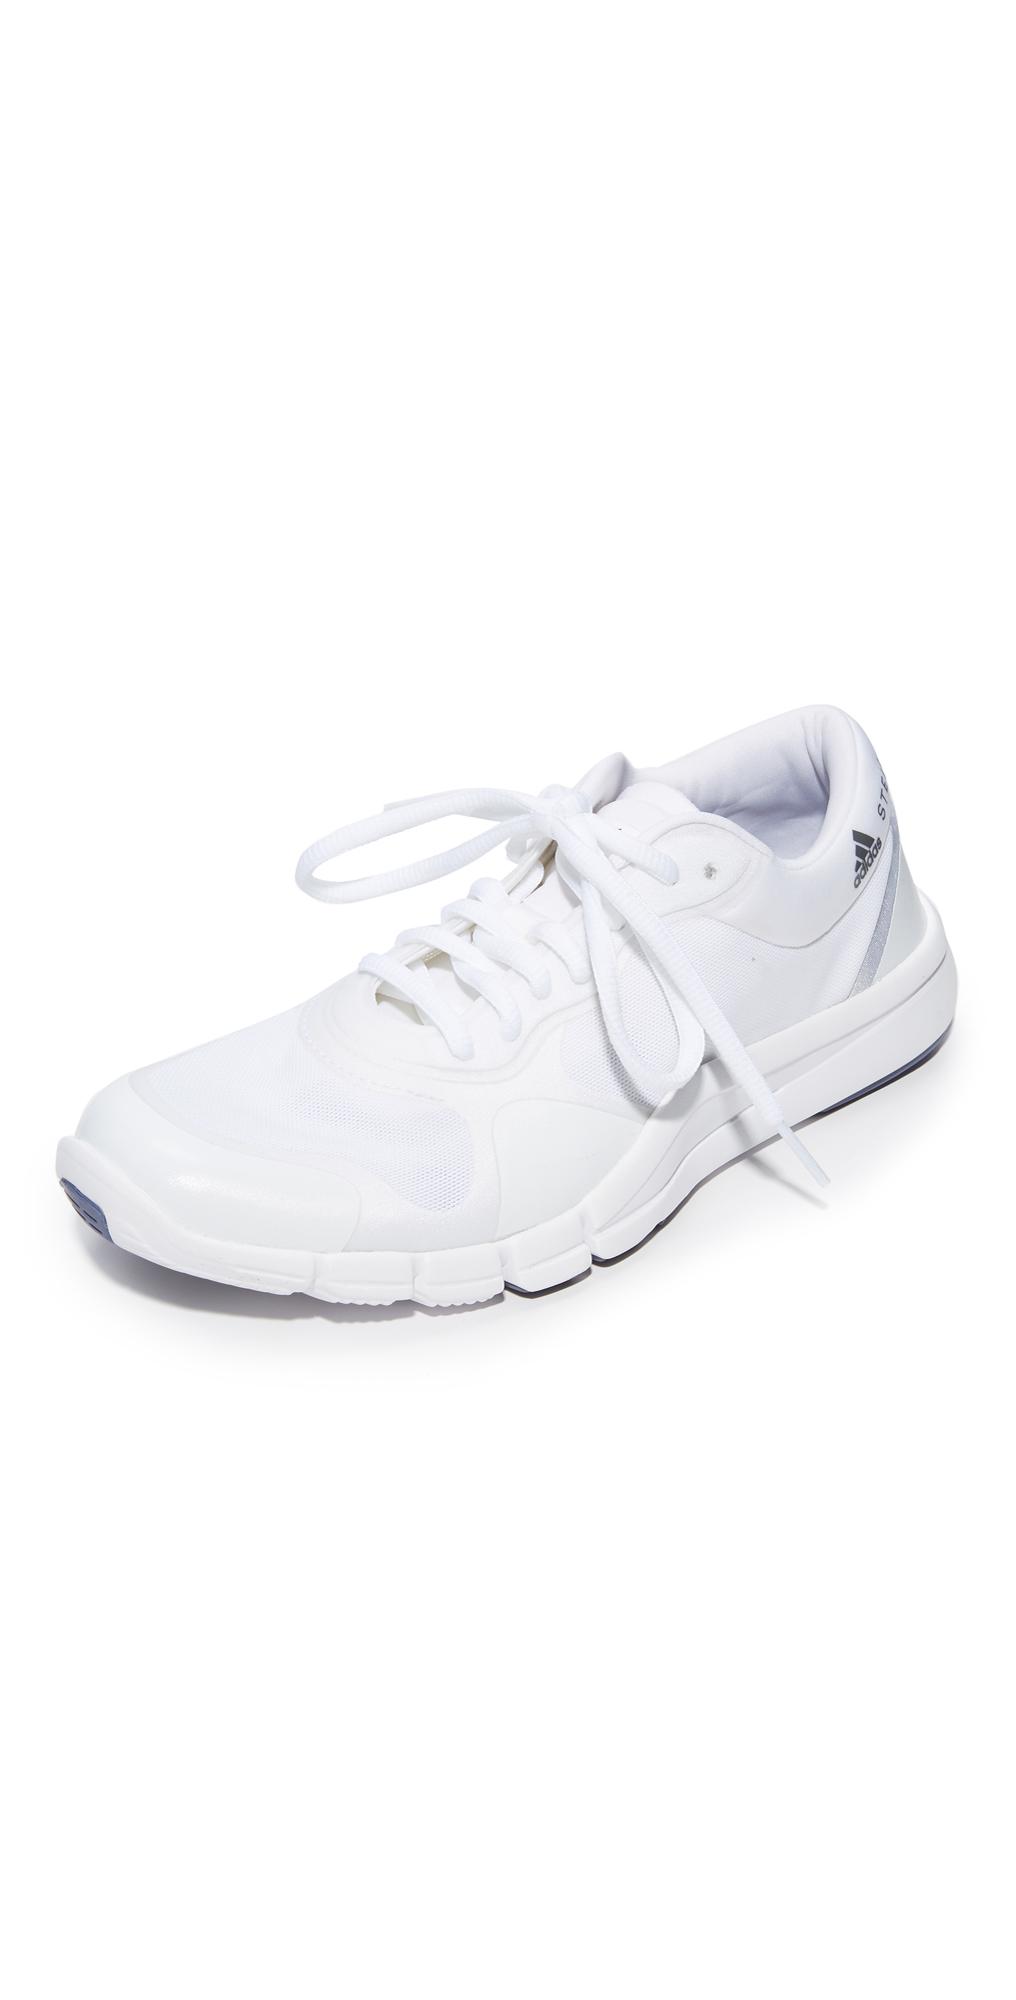 Adipure Sneakers adidas by Stella McCartney